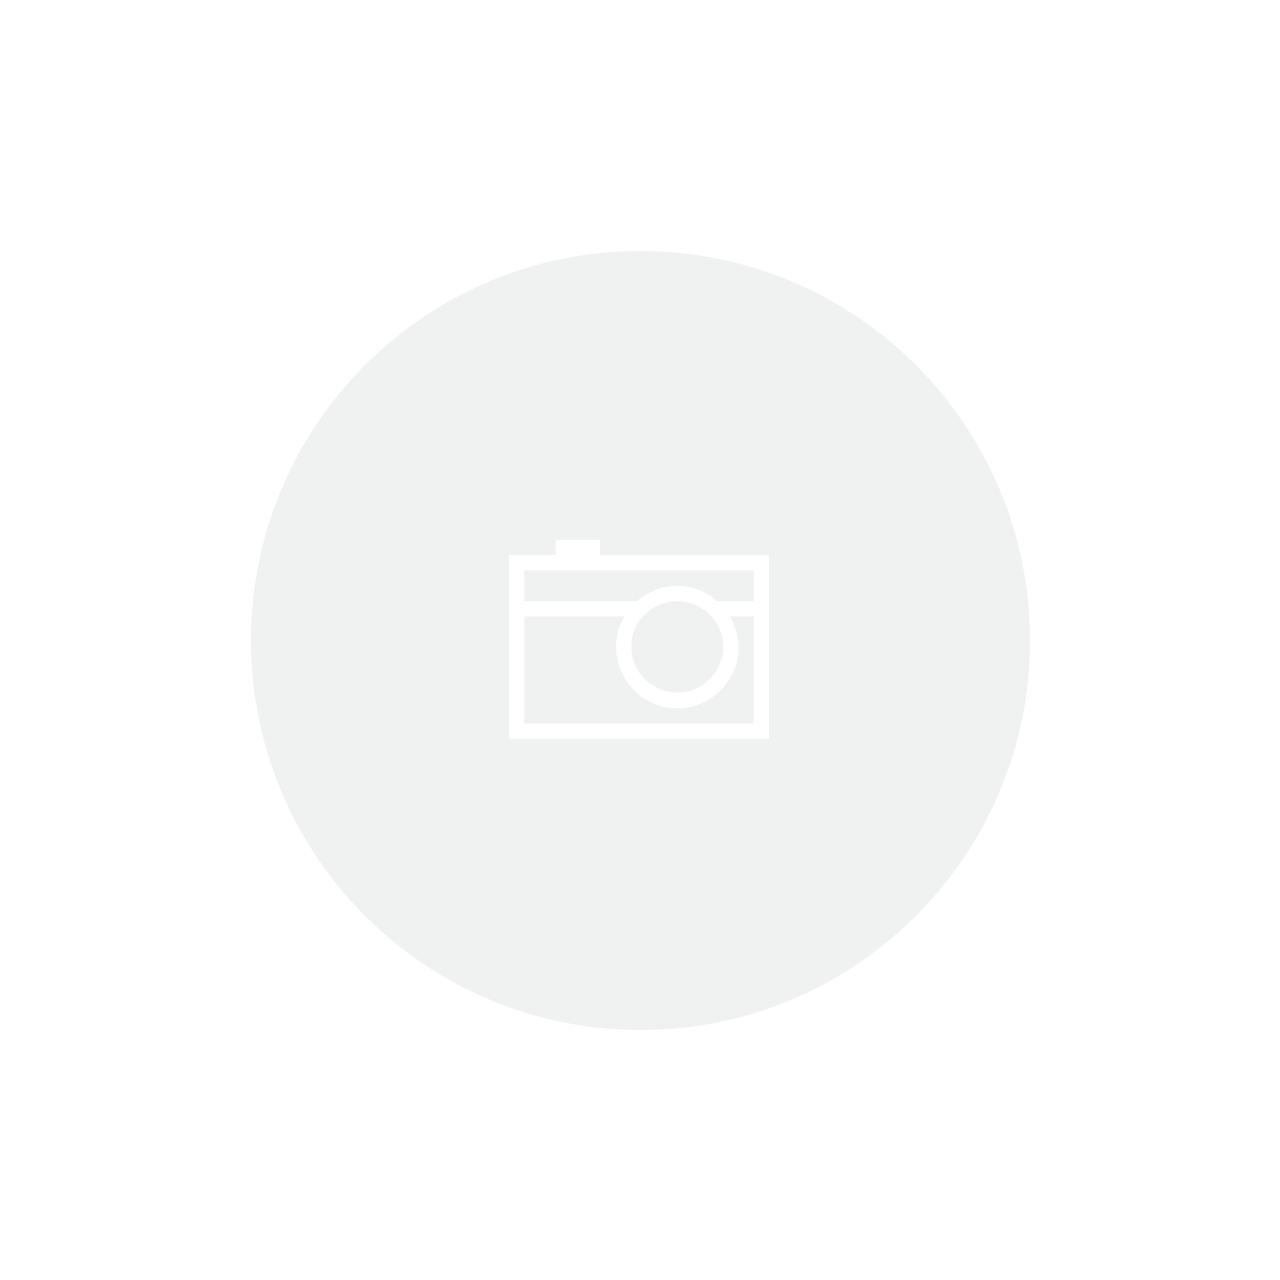 Colher de Arroz em Inox Laguna Tramontina